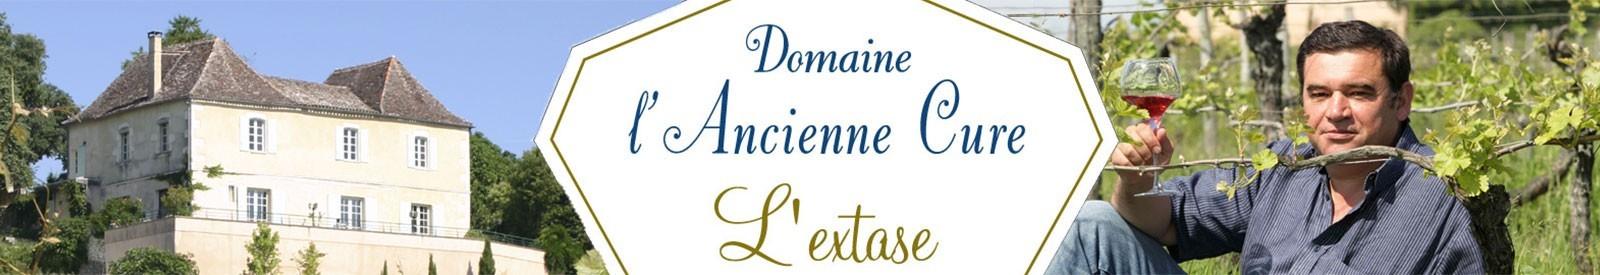 Domaine de l'Ancienne Cure - Bergerac - Organic wines